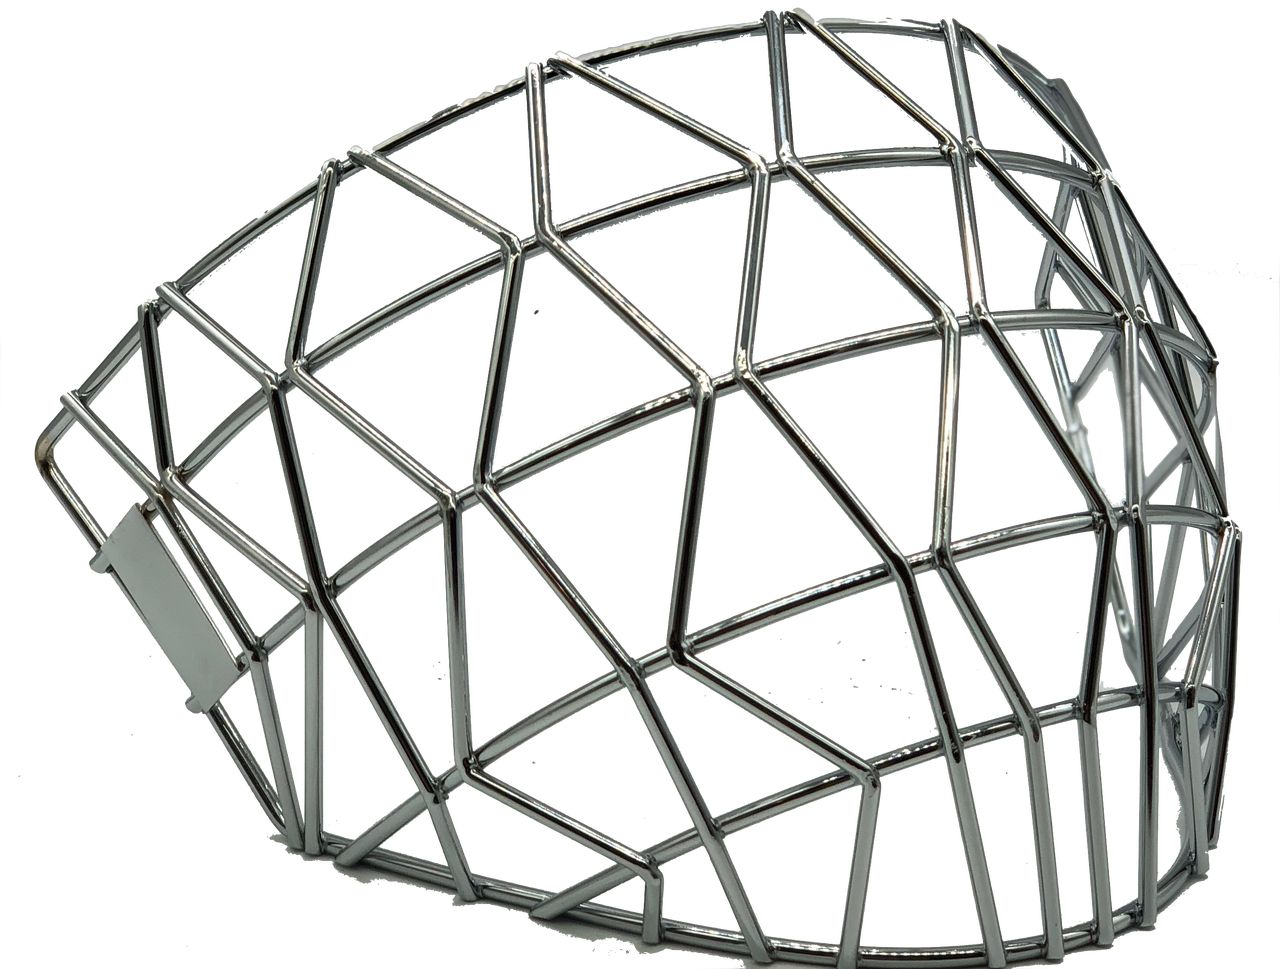 OTNY X1 Ringette Cage